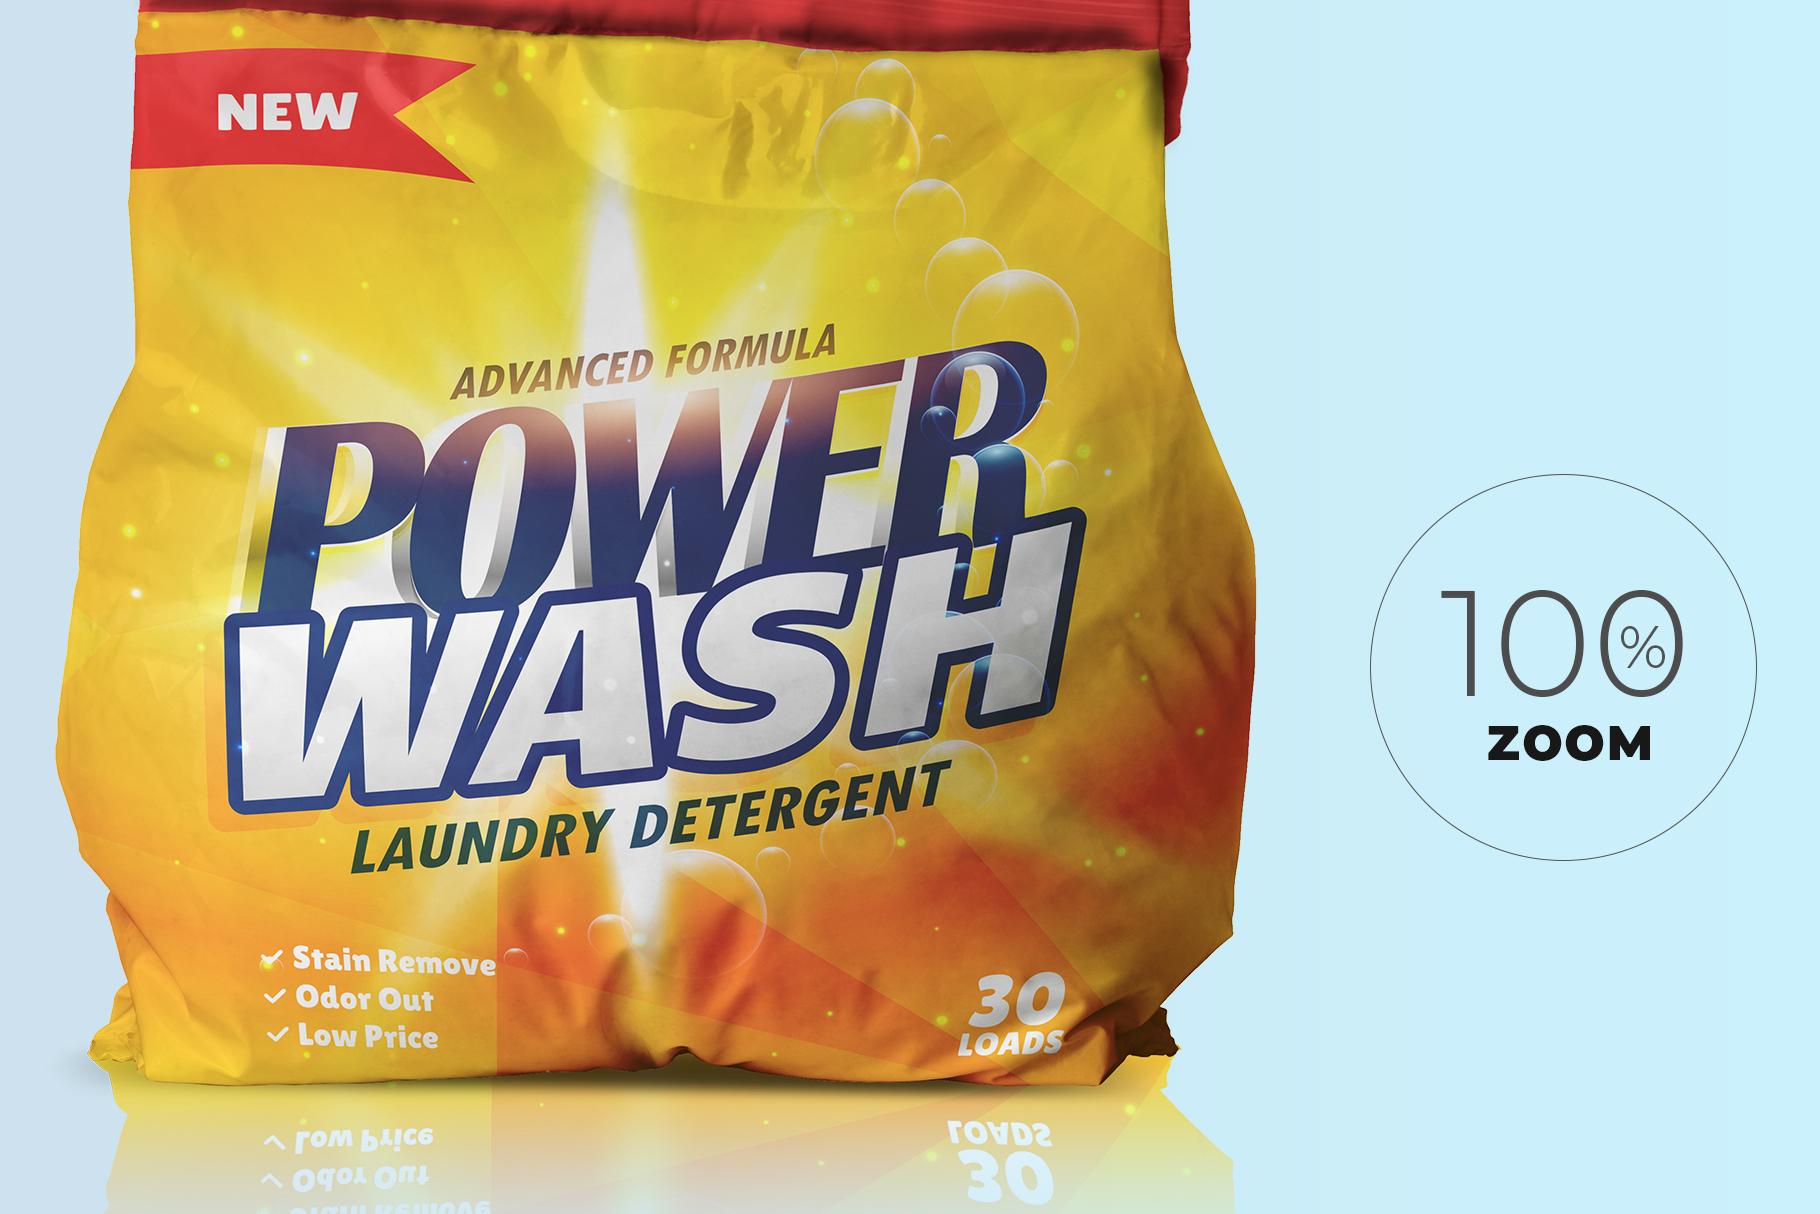 washing powder packaging mockup preview image 6